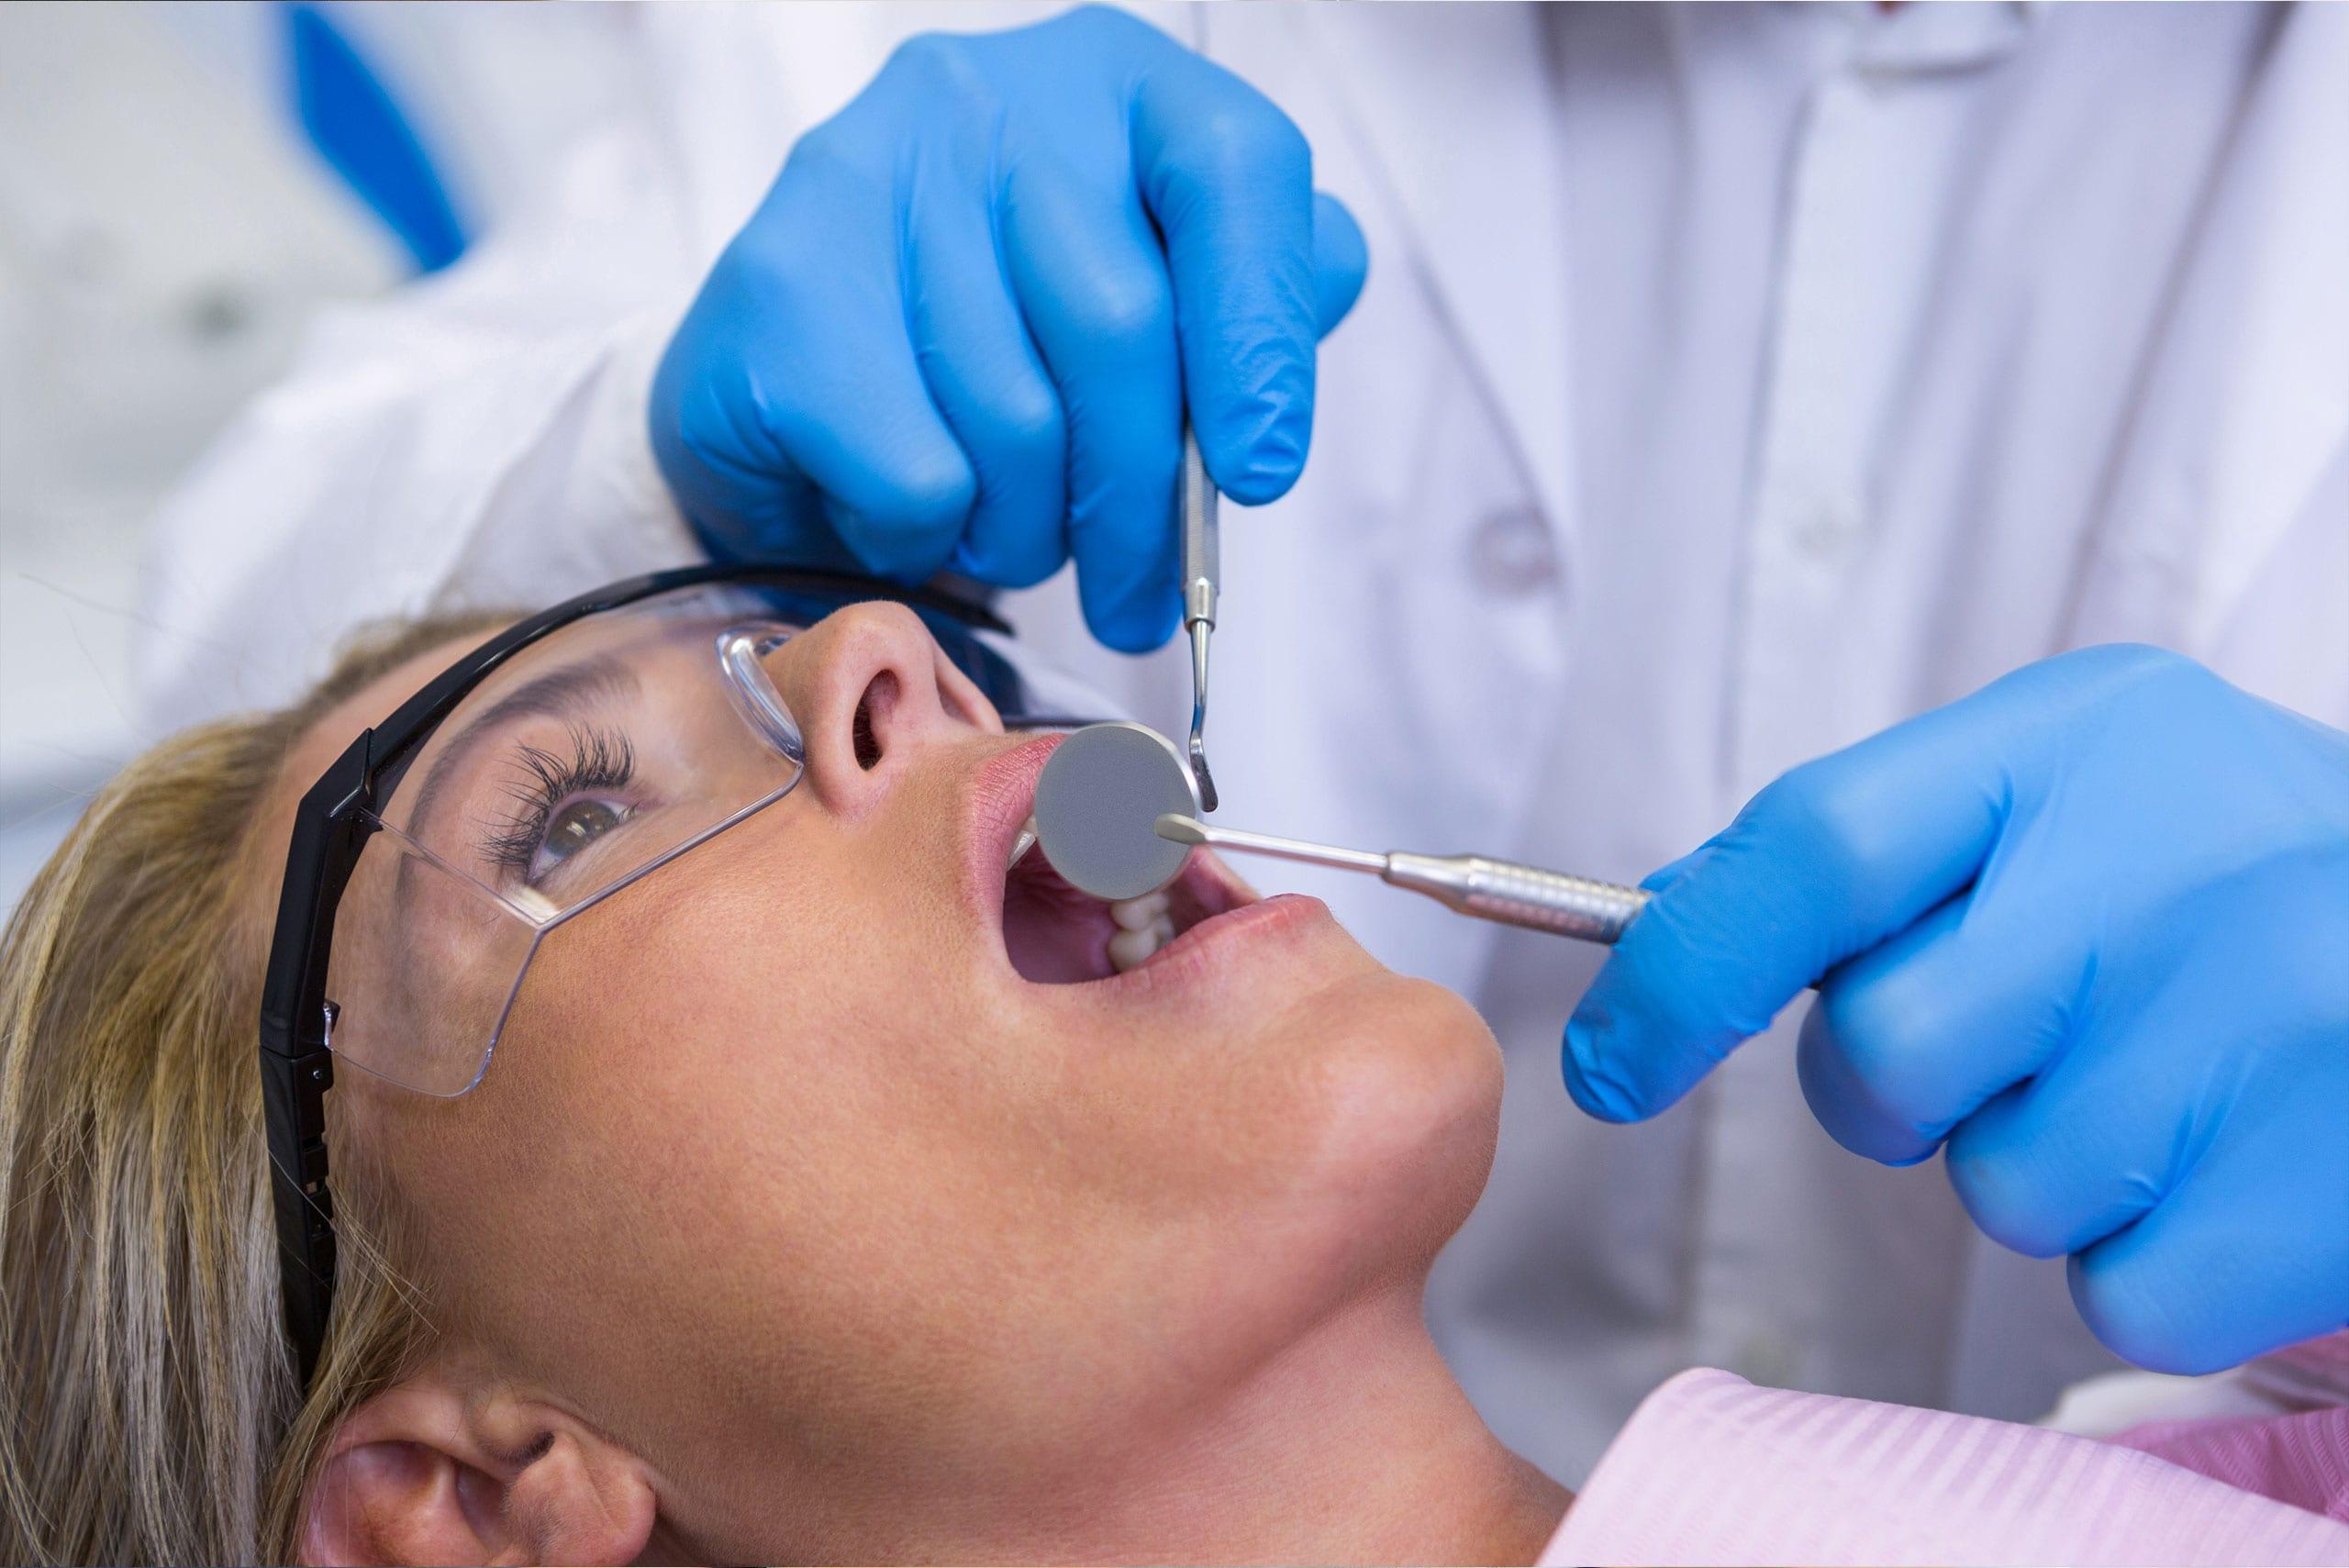 Dental Exam - Central Austin Dentist - Treaty Oak Dental - Dental Cleaning